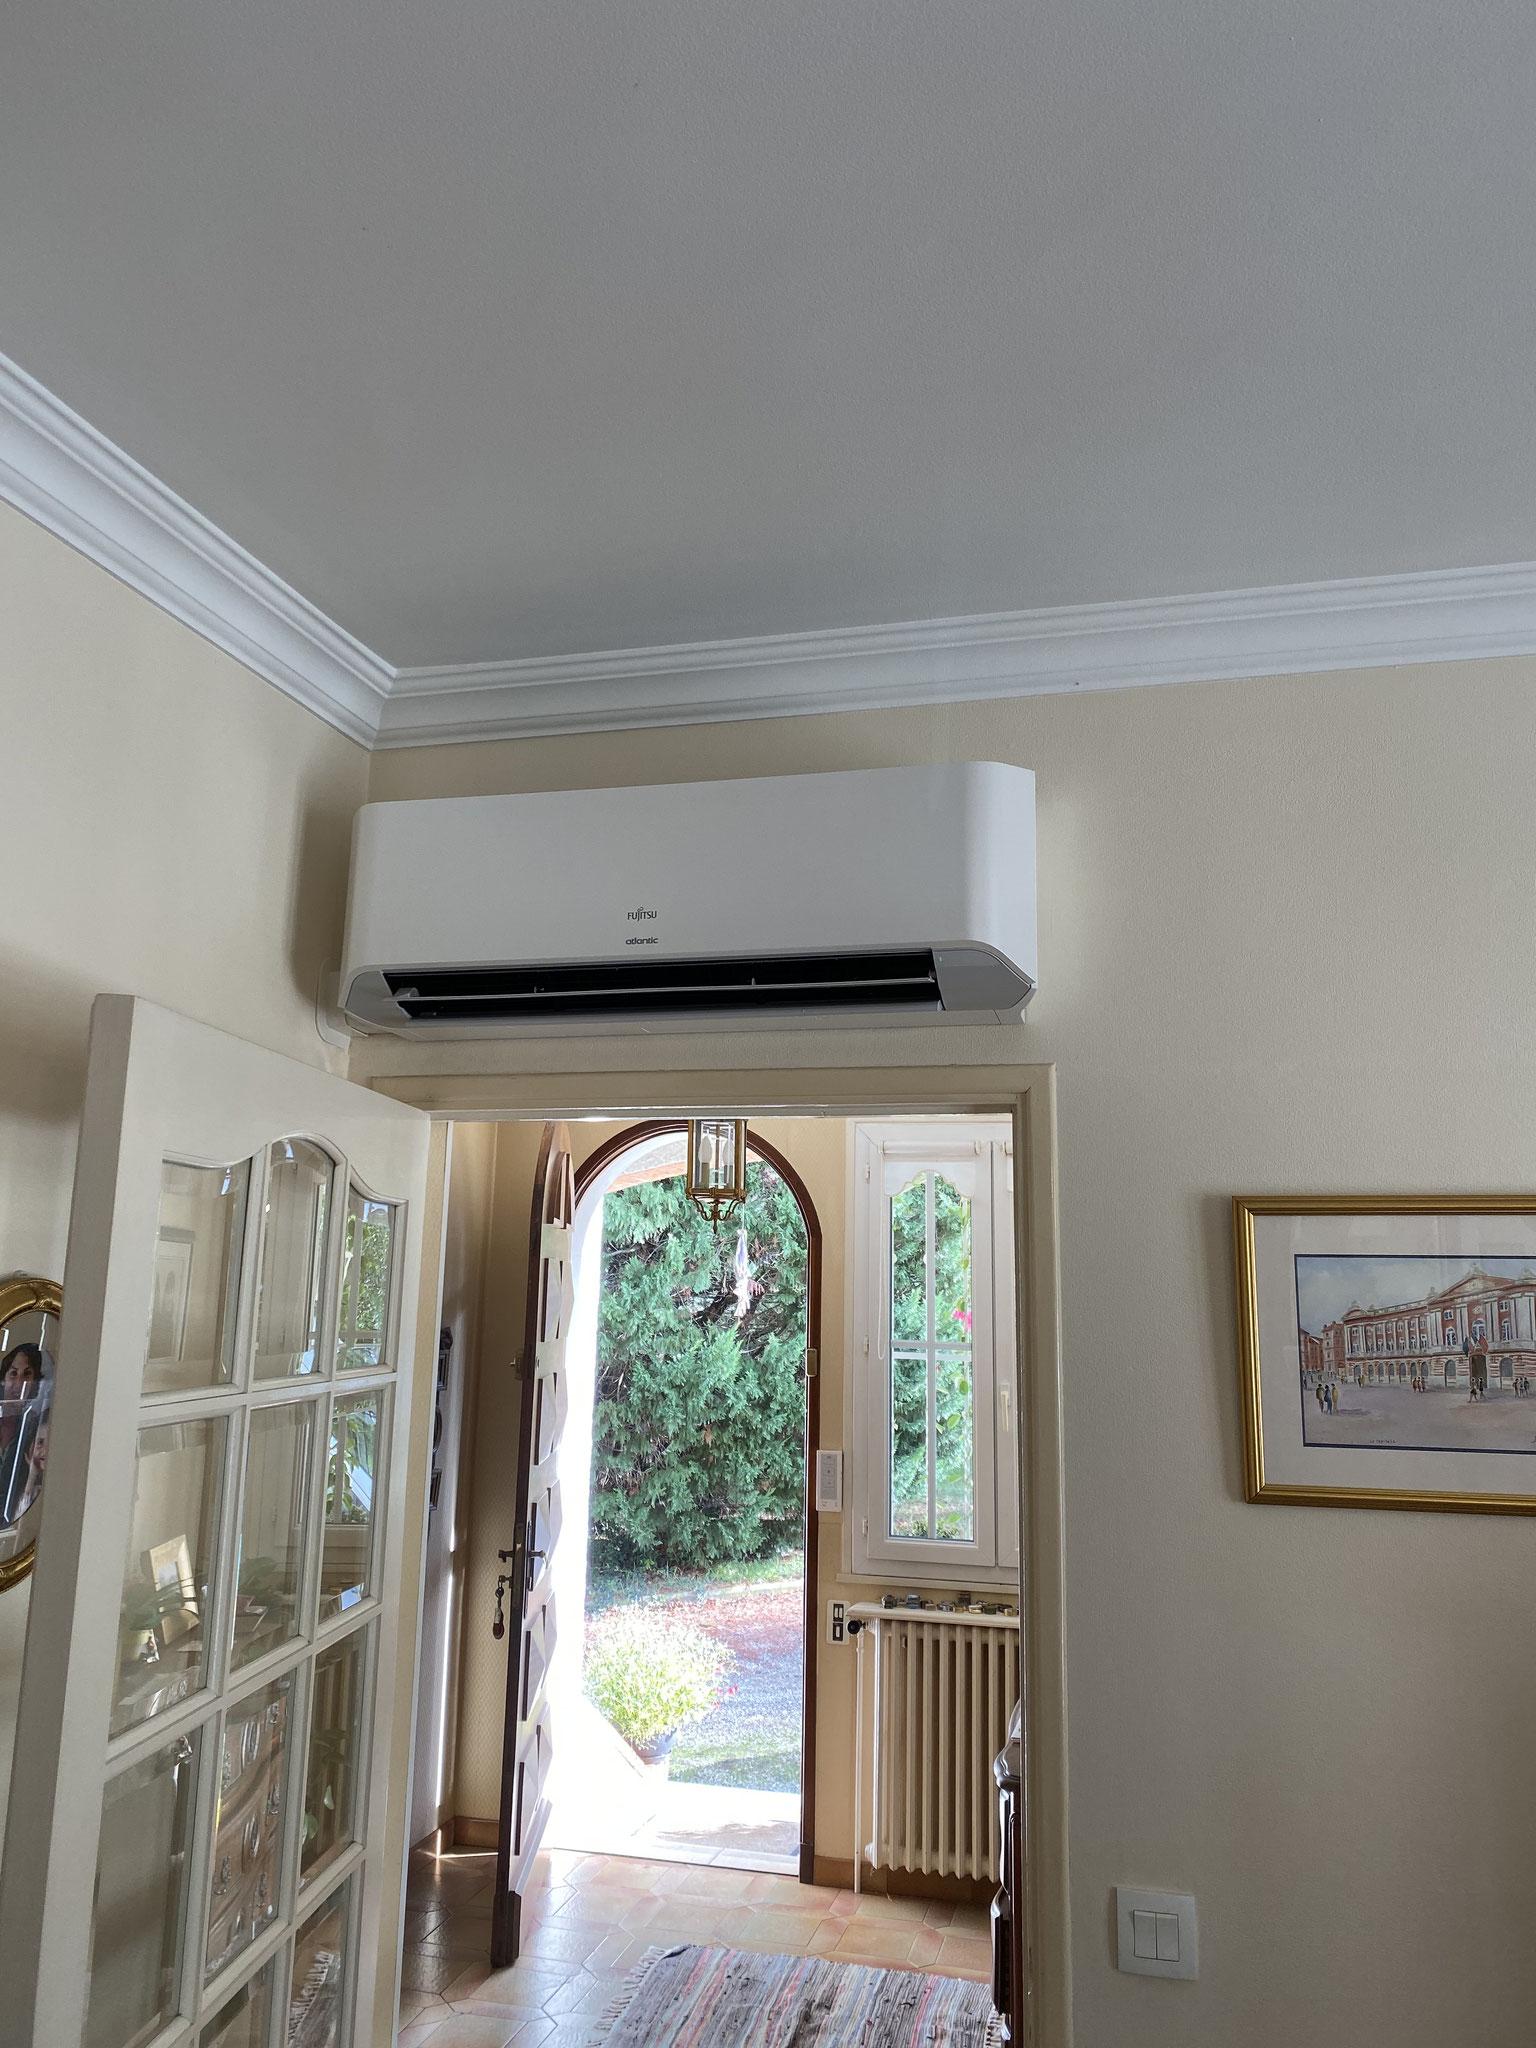 Installation d'une climatisation Multisplit Venerque